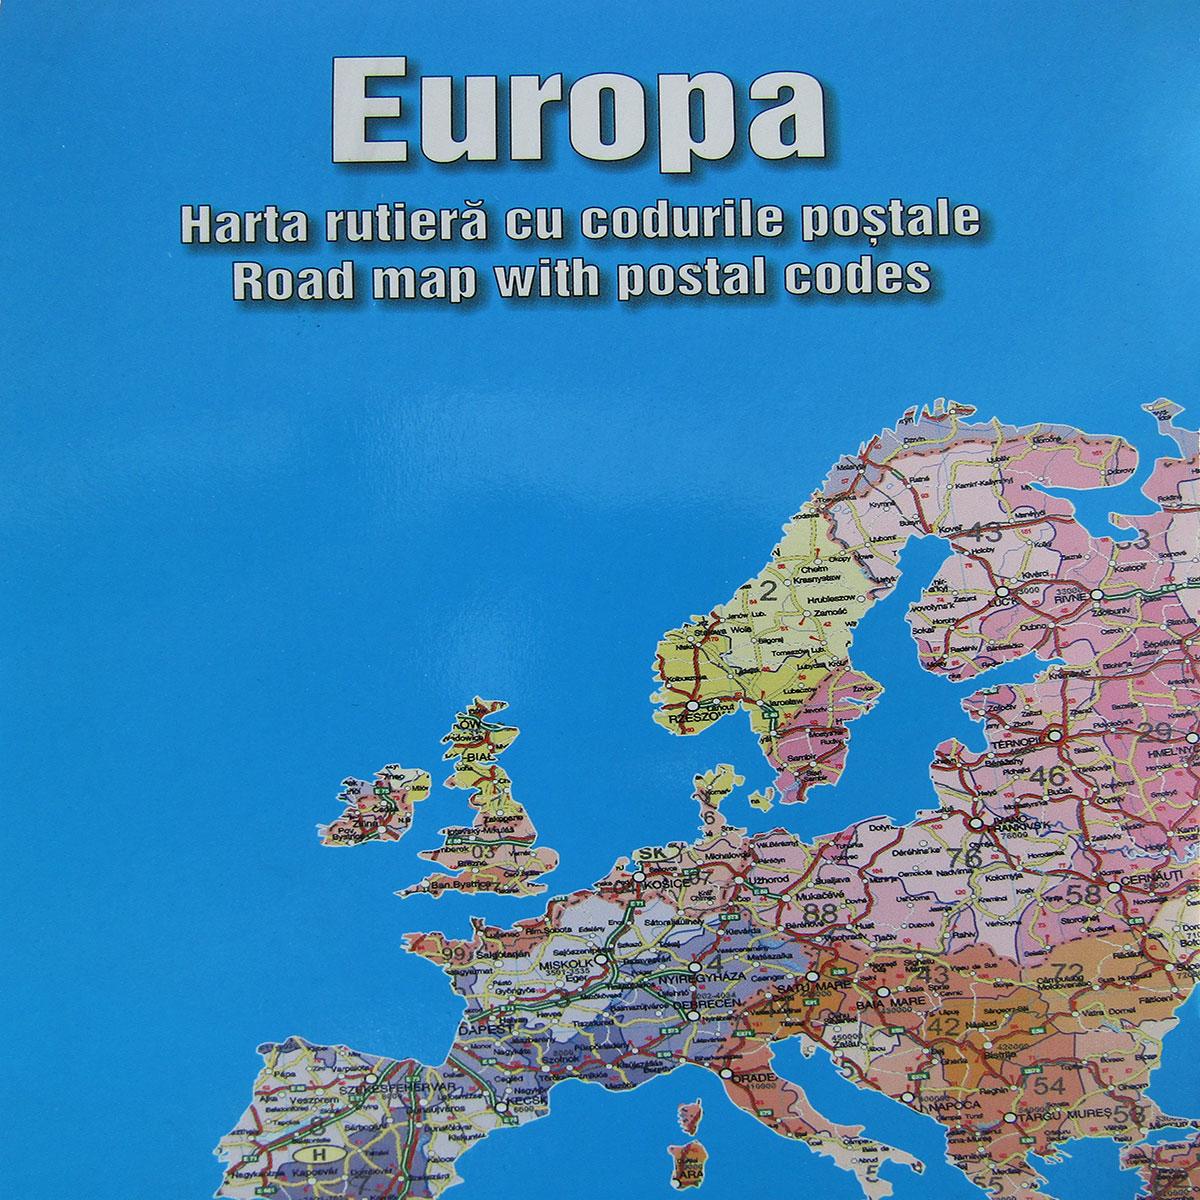 Harta pliata Europa cu coduri postale